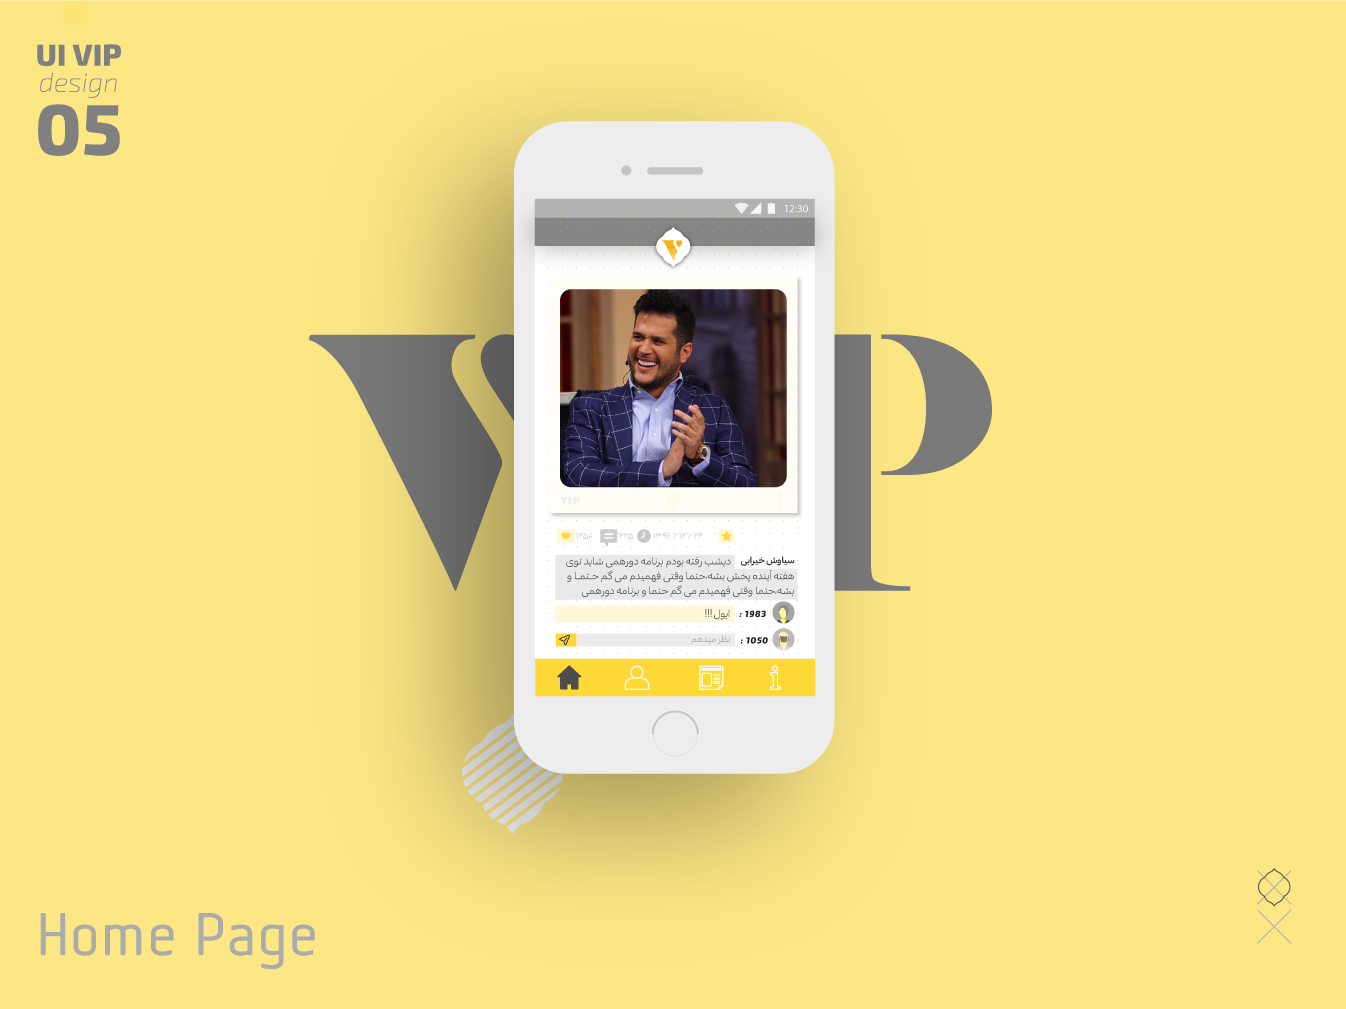 Ui Vip Design 05 Siavash Kheirabi social app ui  ux design ui pack applicaiton app